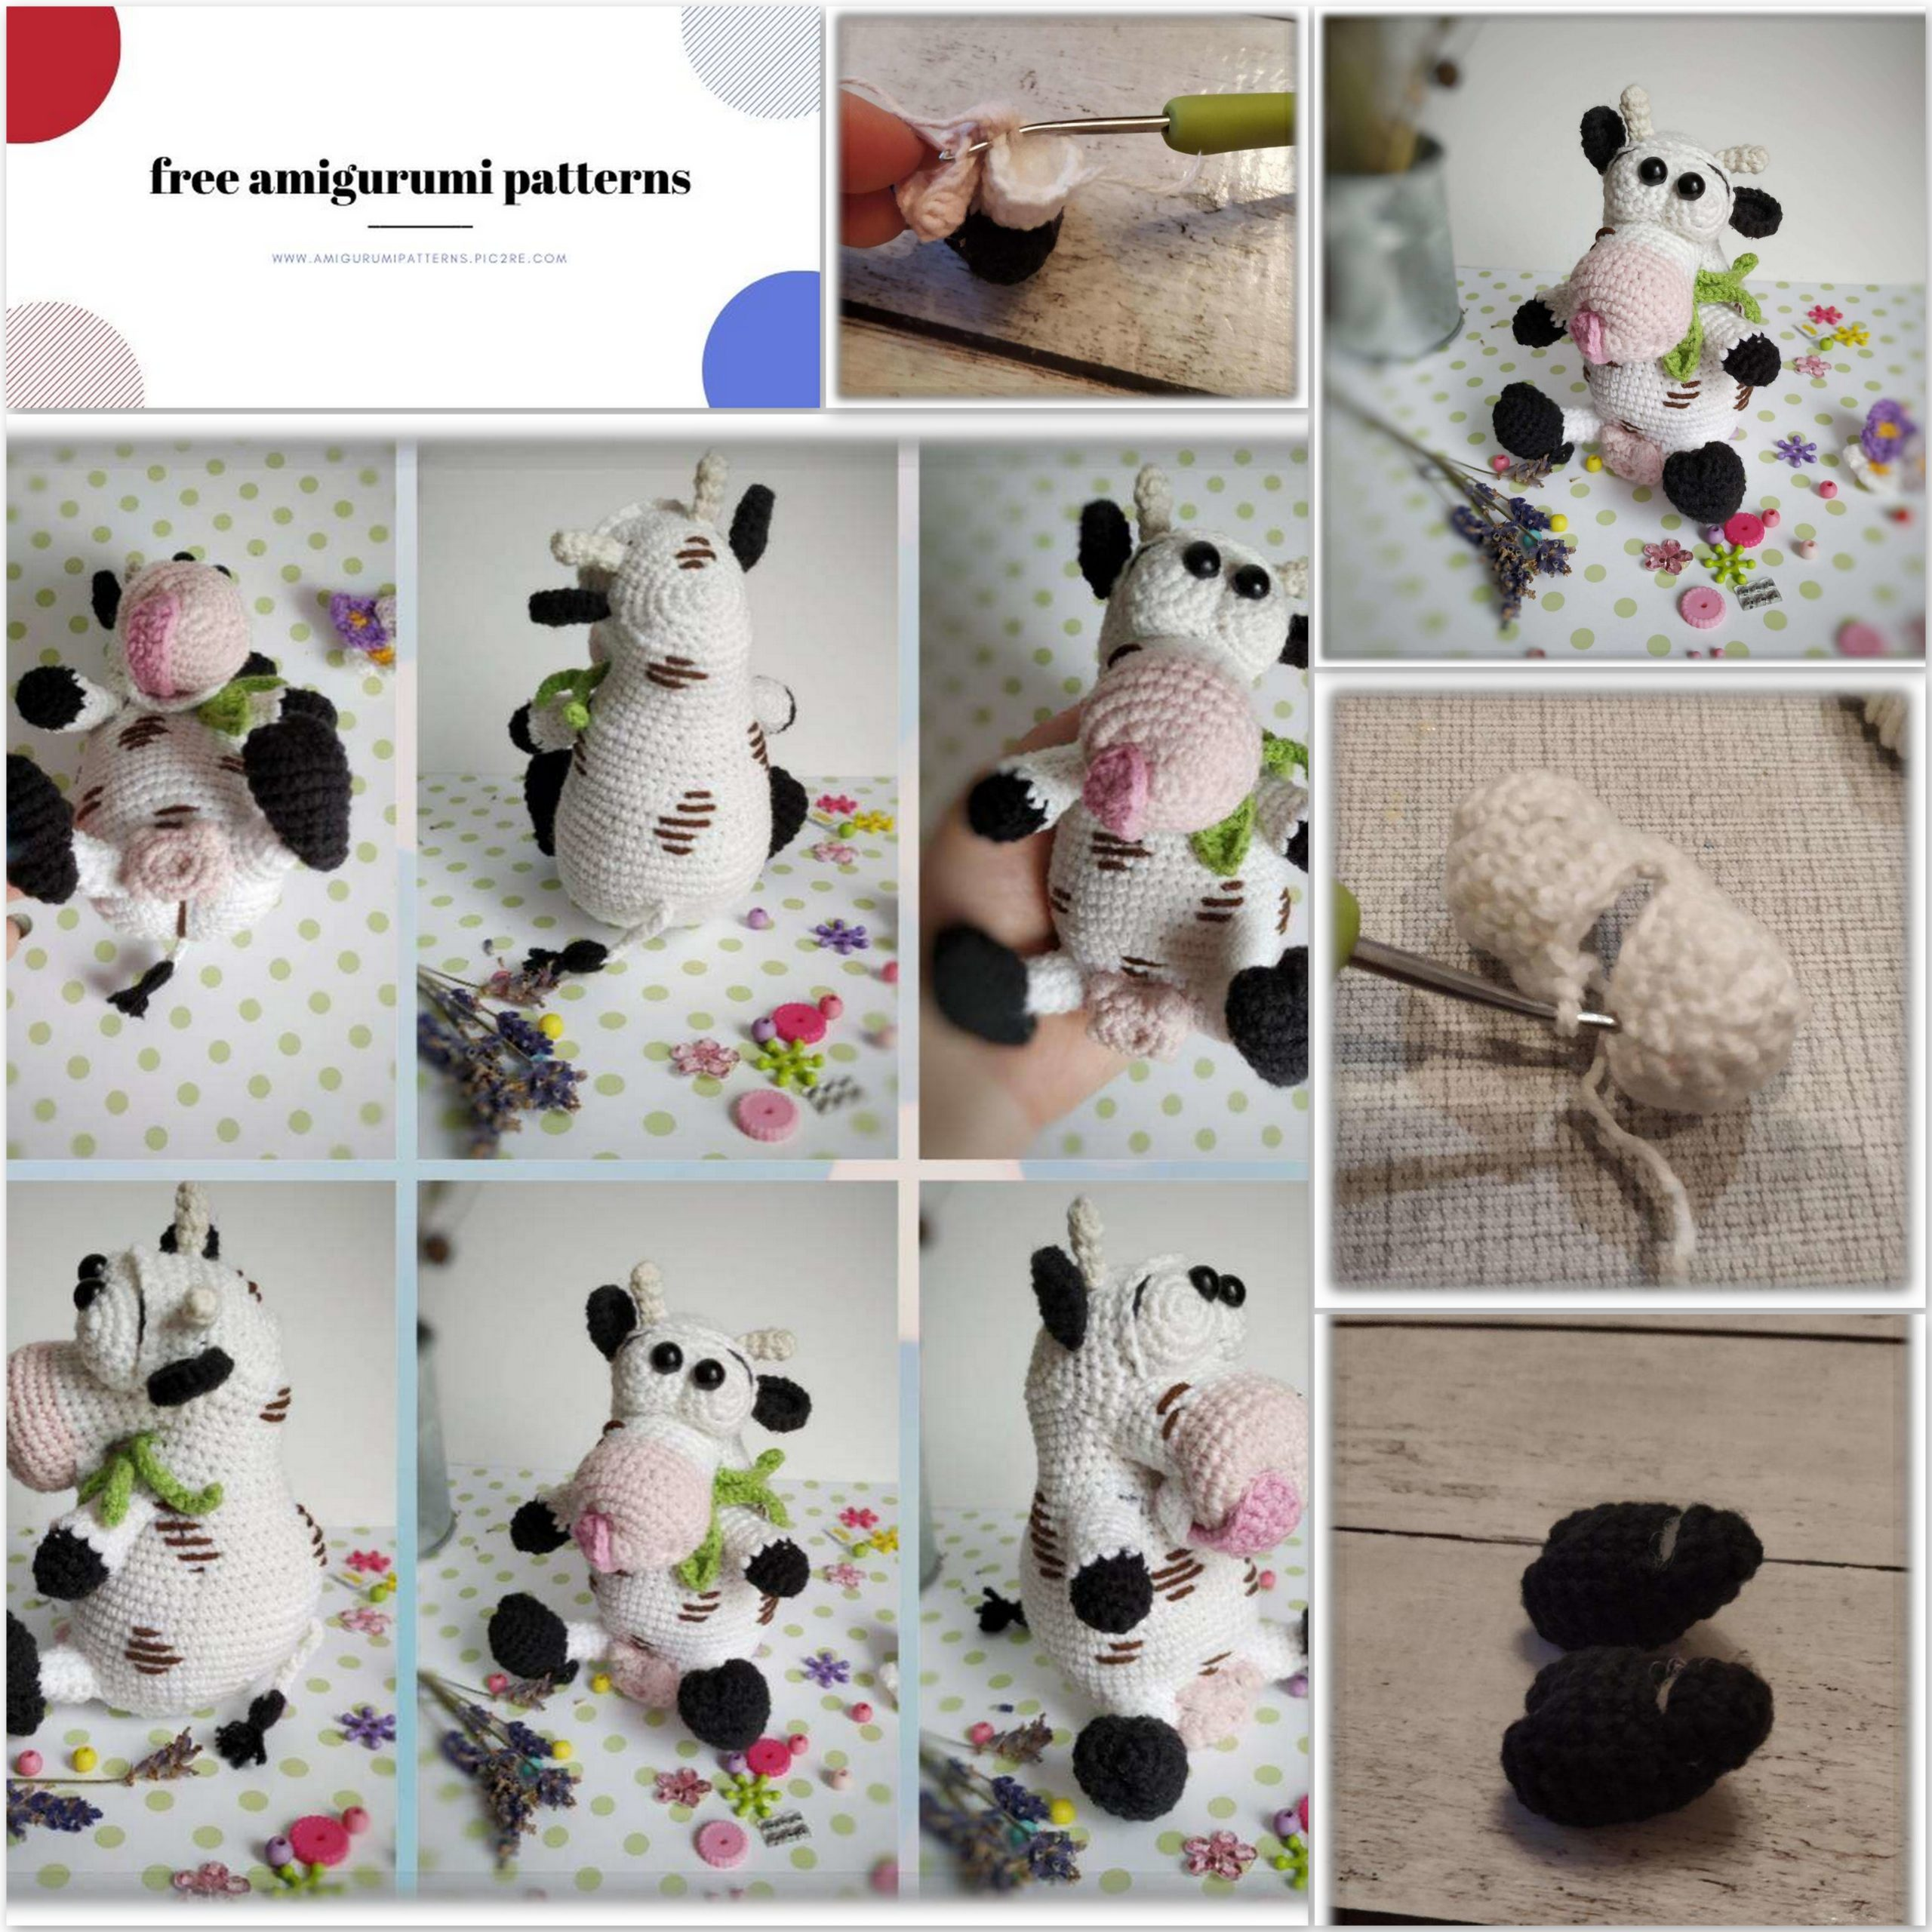 Amigurumi Doll Pacifier Baby Free Crochet Pattern - Amigurumi Free Patterns  and Amigurumi Tutorials | 2560x2560